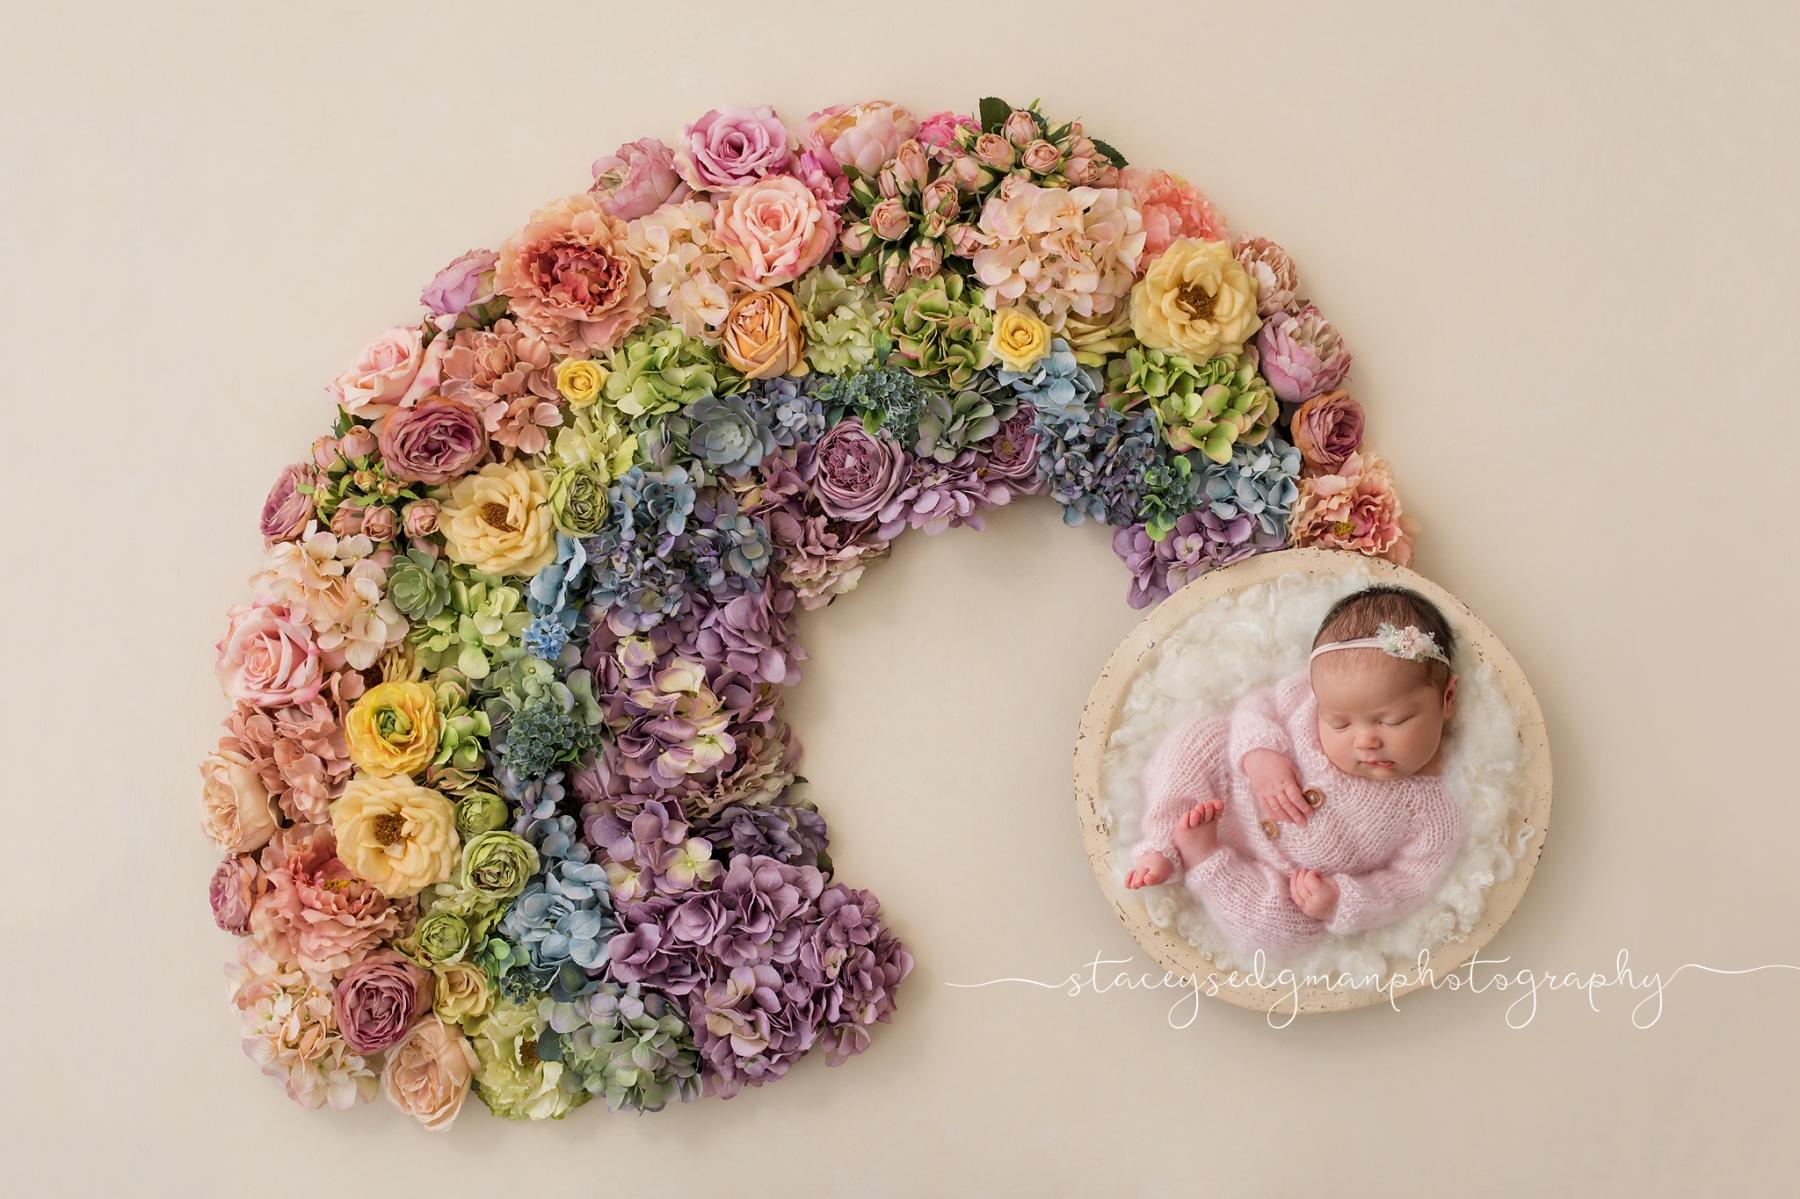 newborn girl on luisa dunn backdrop with rainbow of flowers